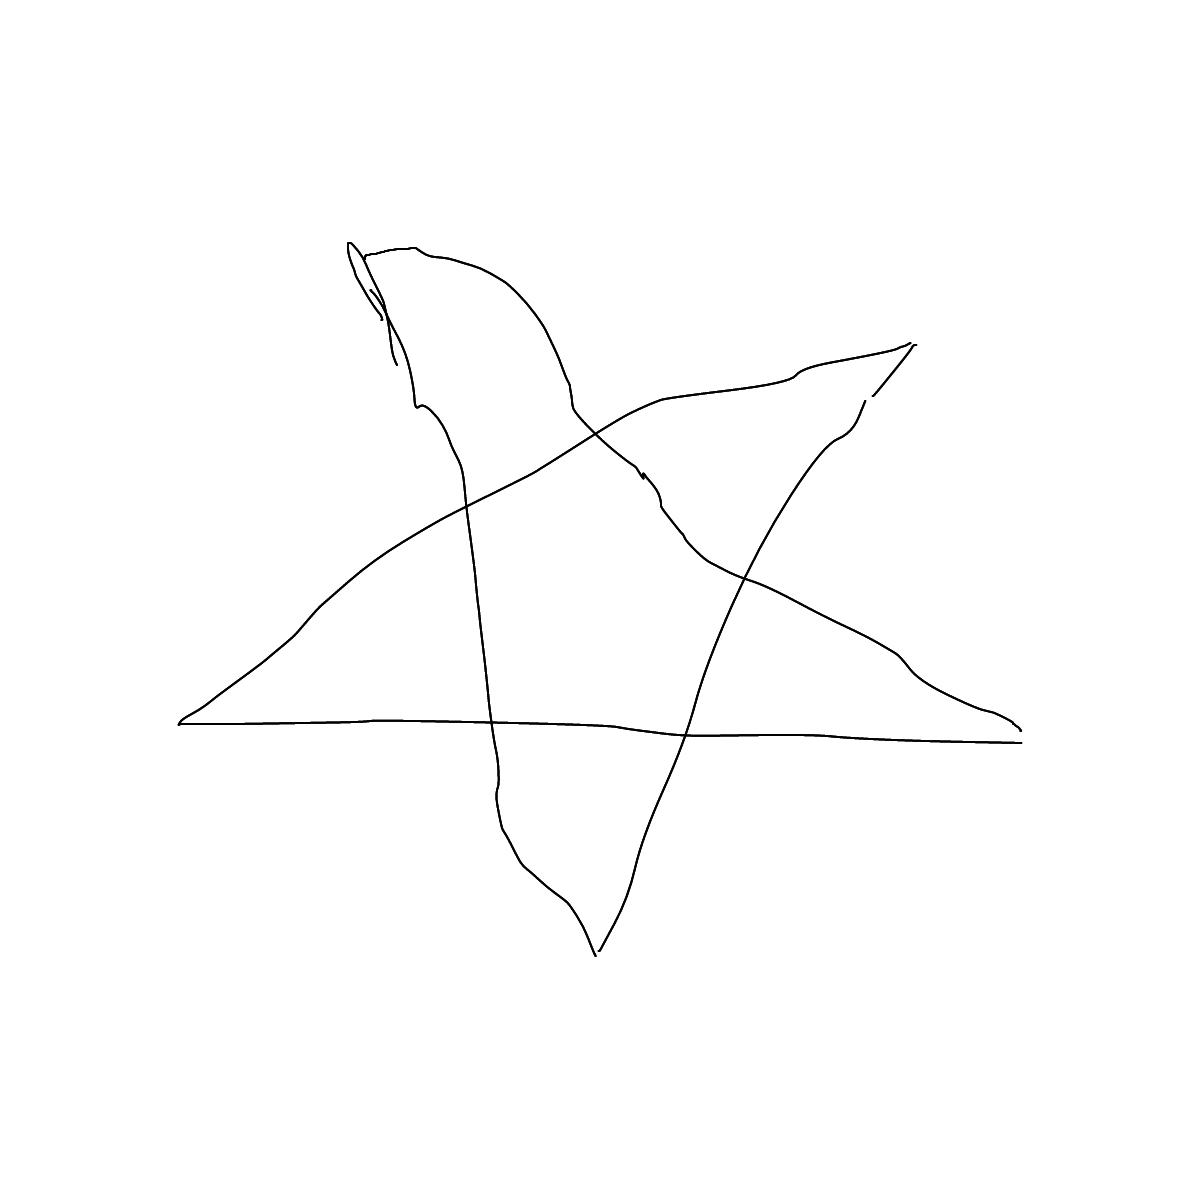 BAAAM drawing#1600 lat:54.6057434082031250lng: 18.2316055297851560